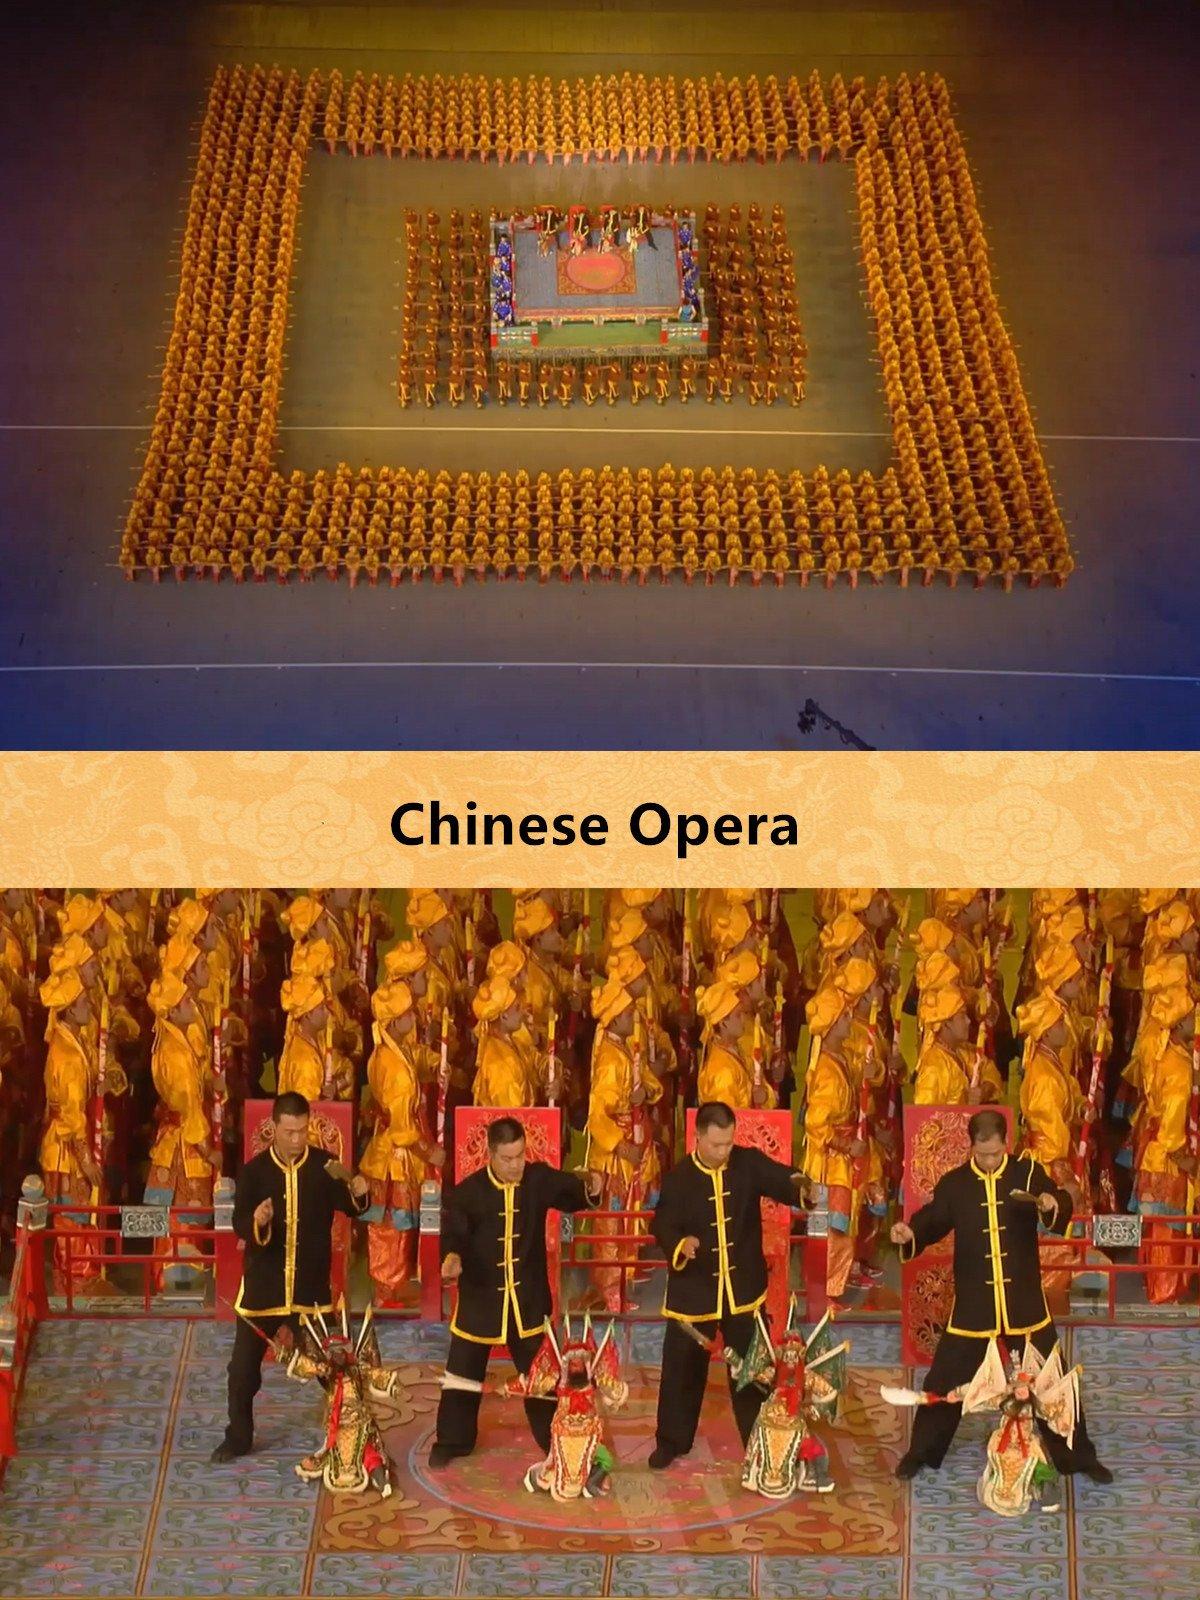 Clip: Chinese Opera